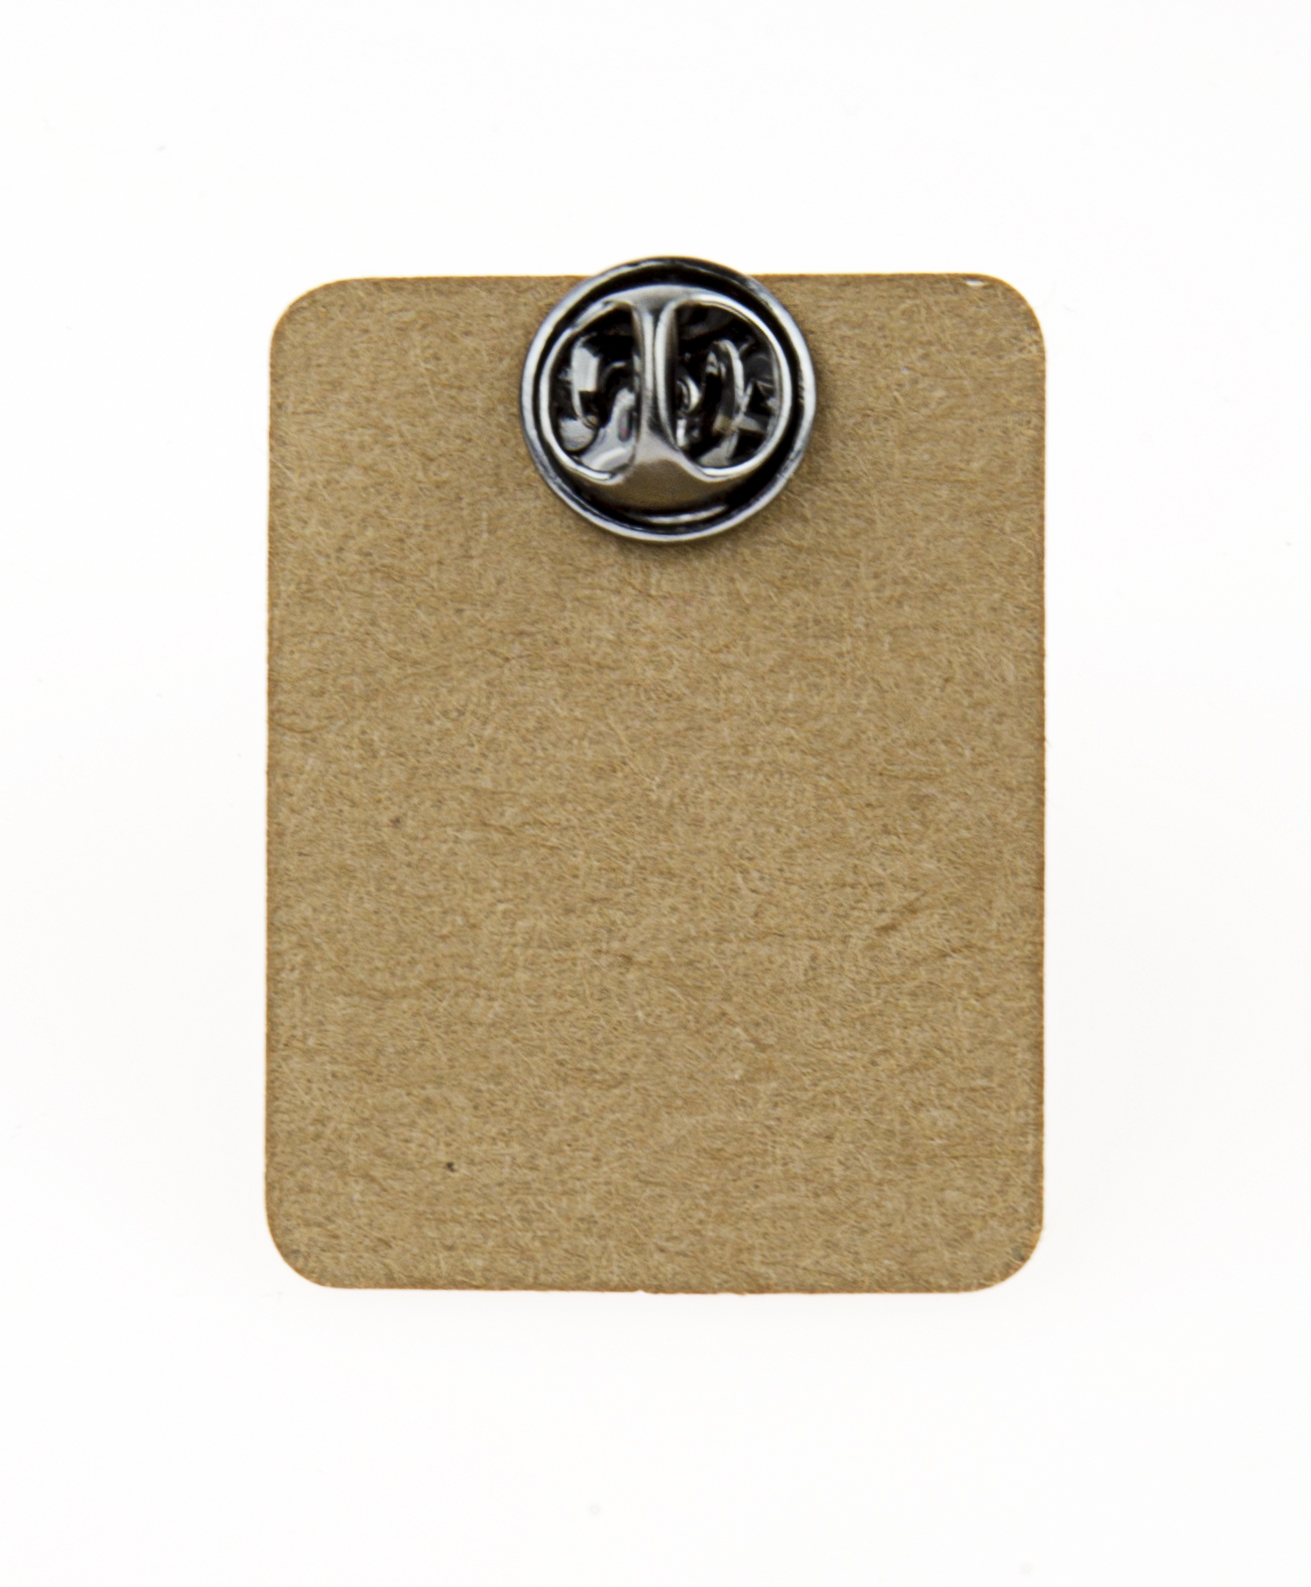 Metal Saturn Planet Enamel Pin Badge